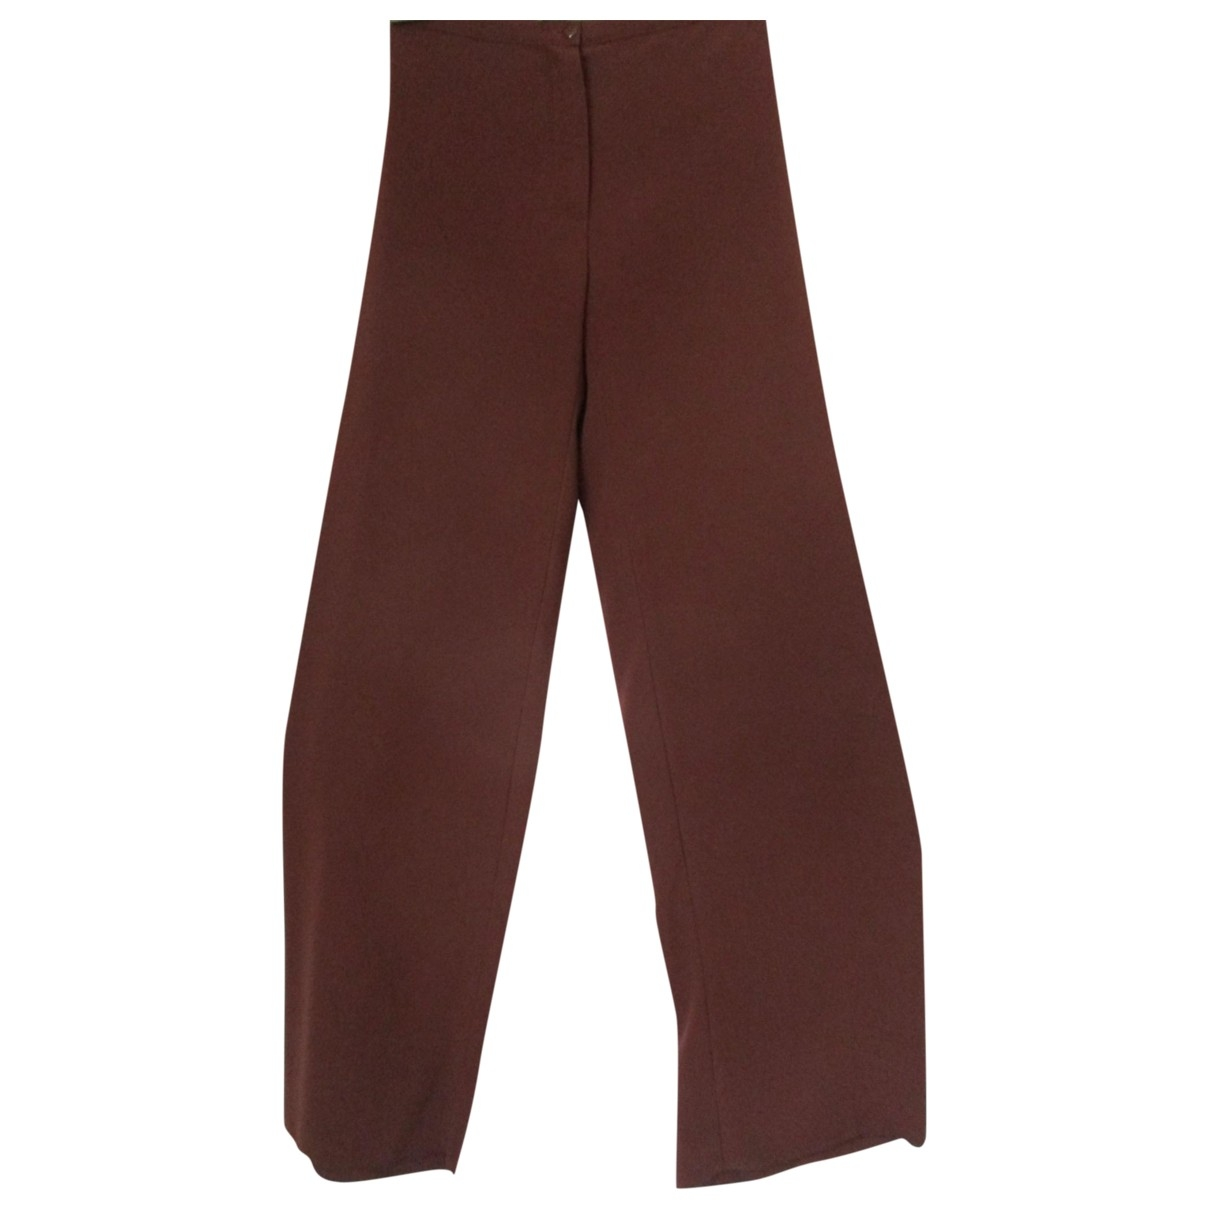 Salvatore Ferragamo \N Brown Trousers for Women 40 IT